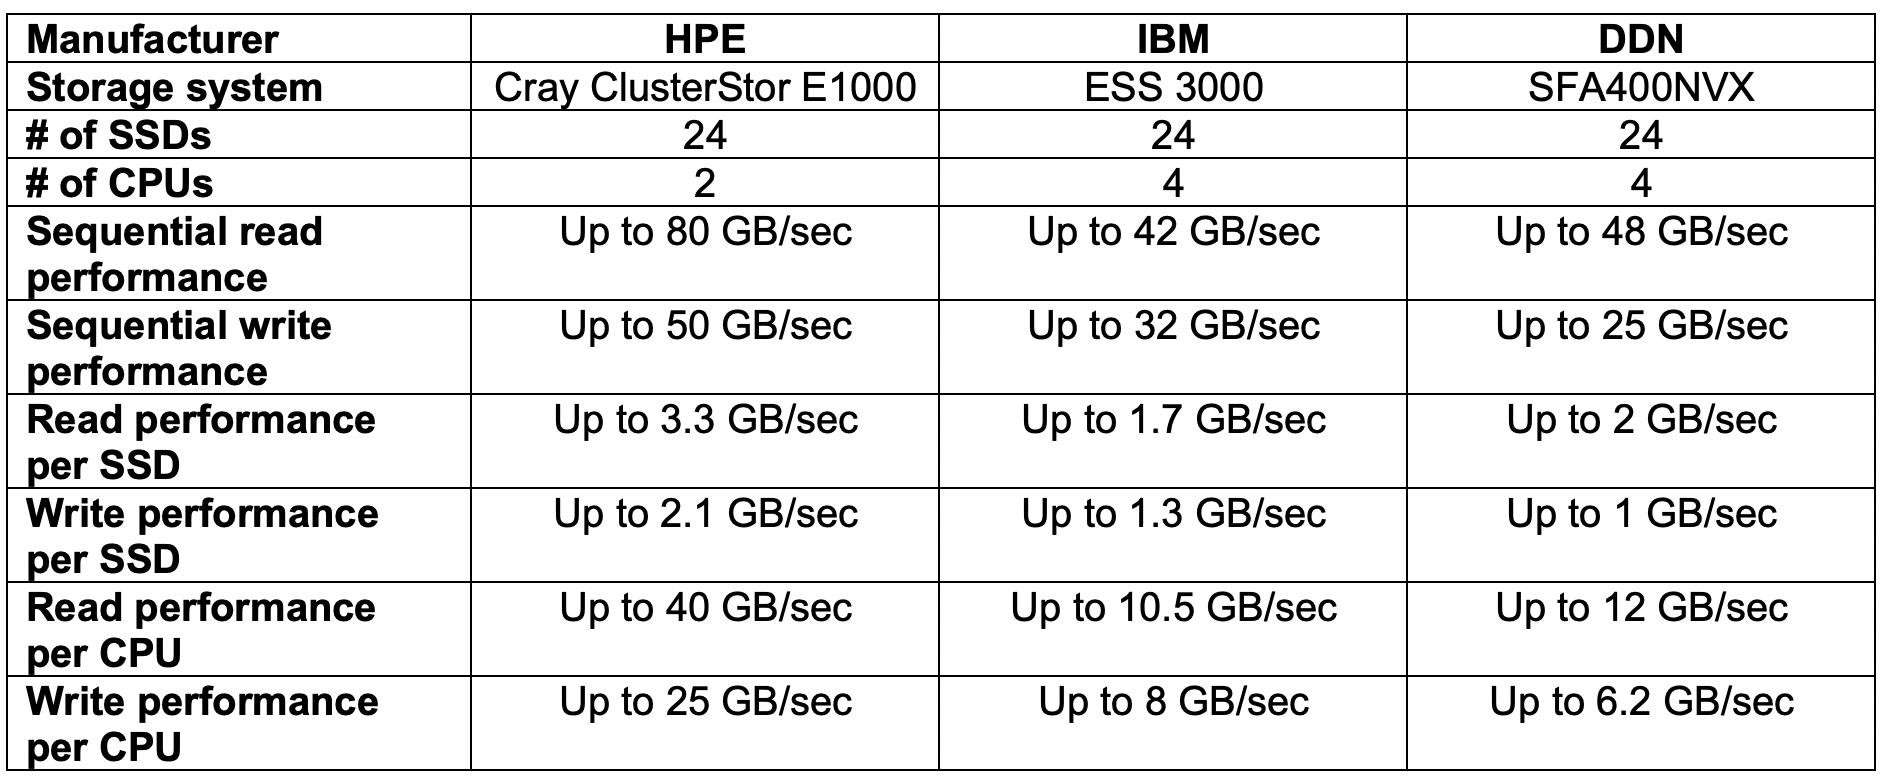 HPE HPC storage - comparison table.png